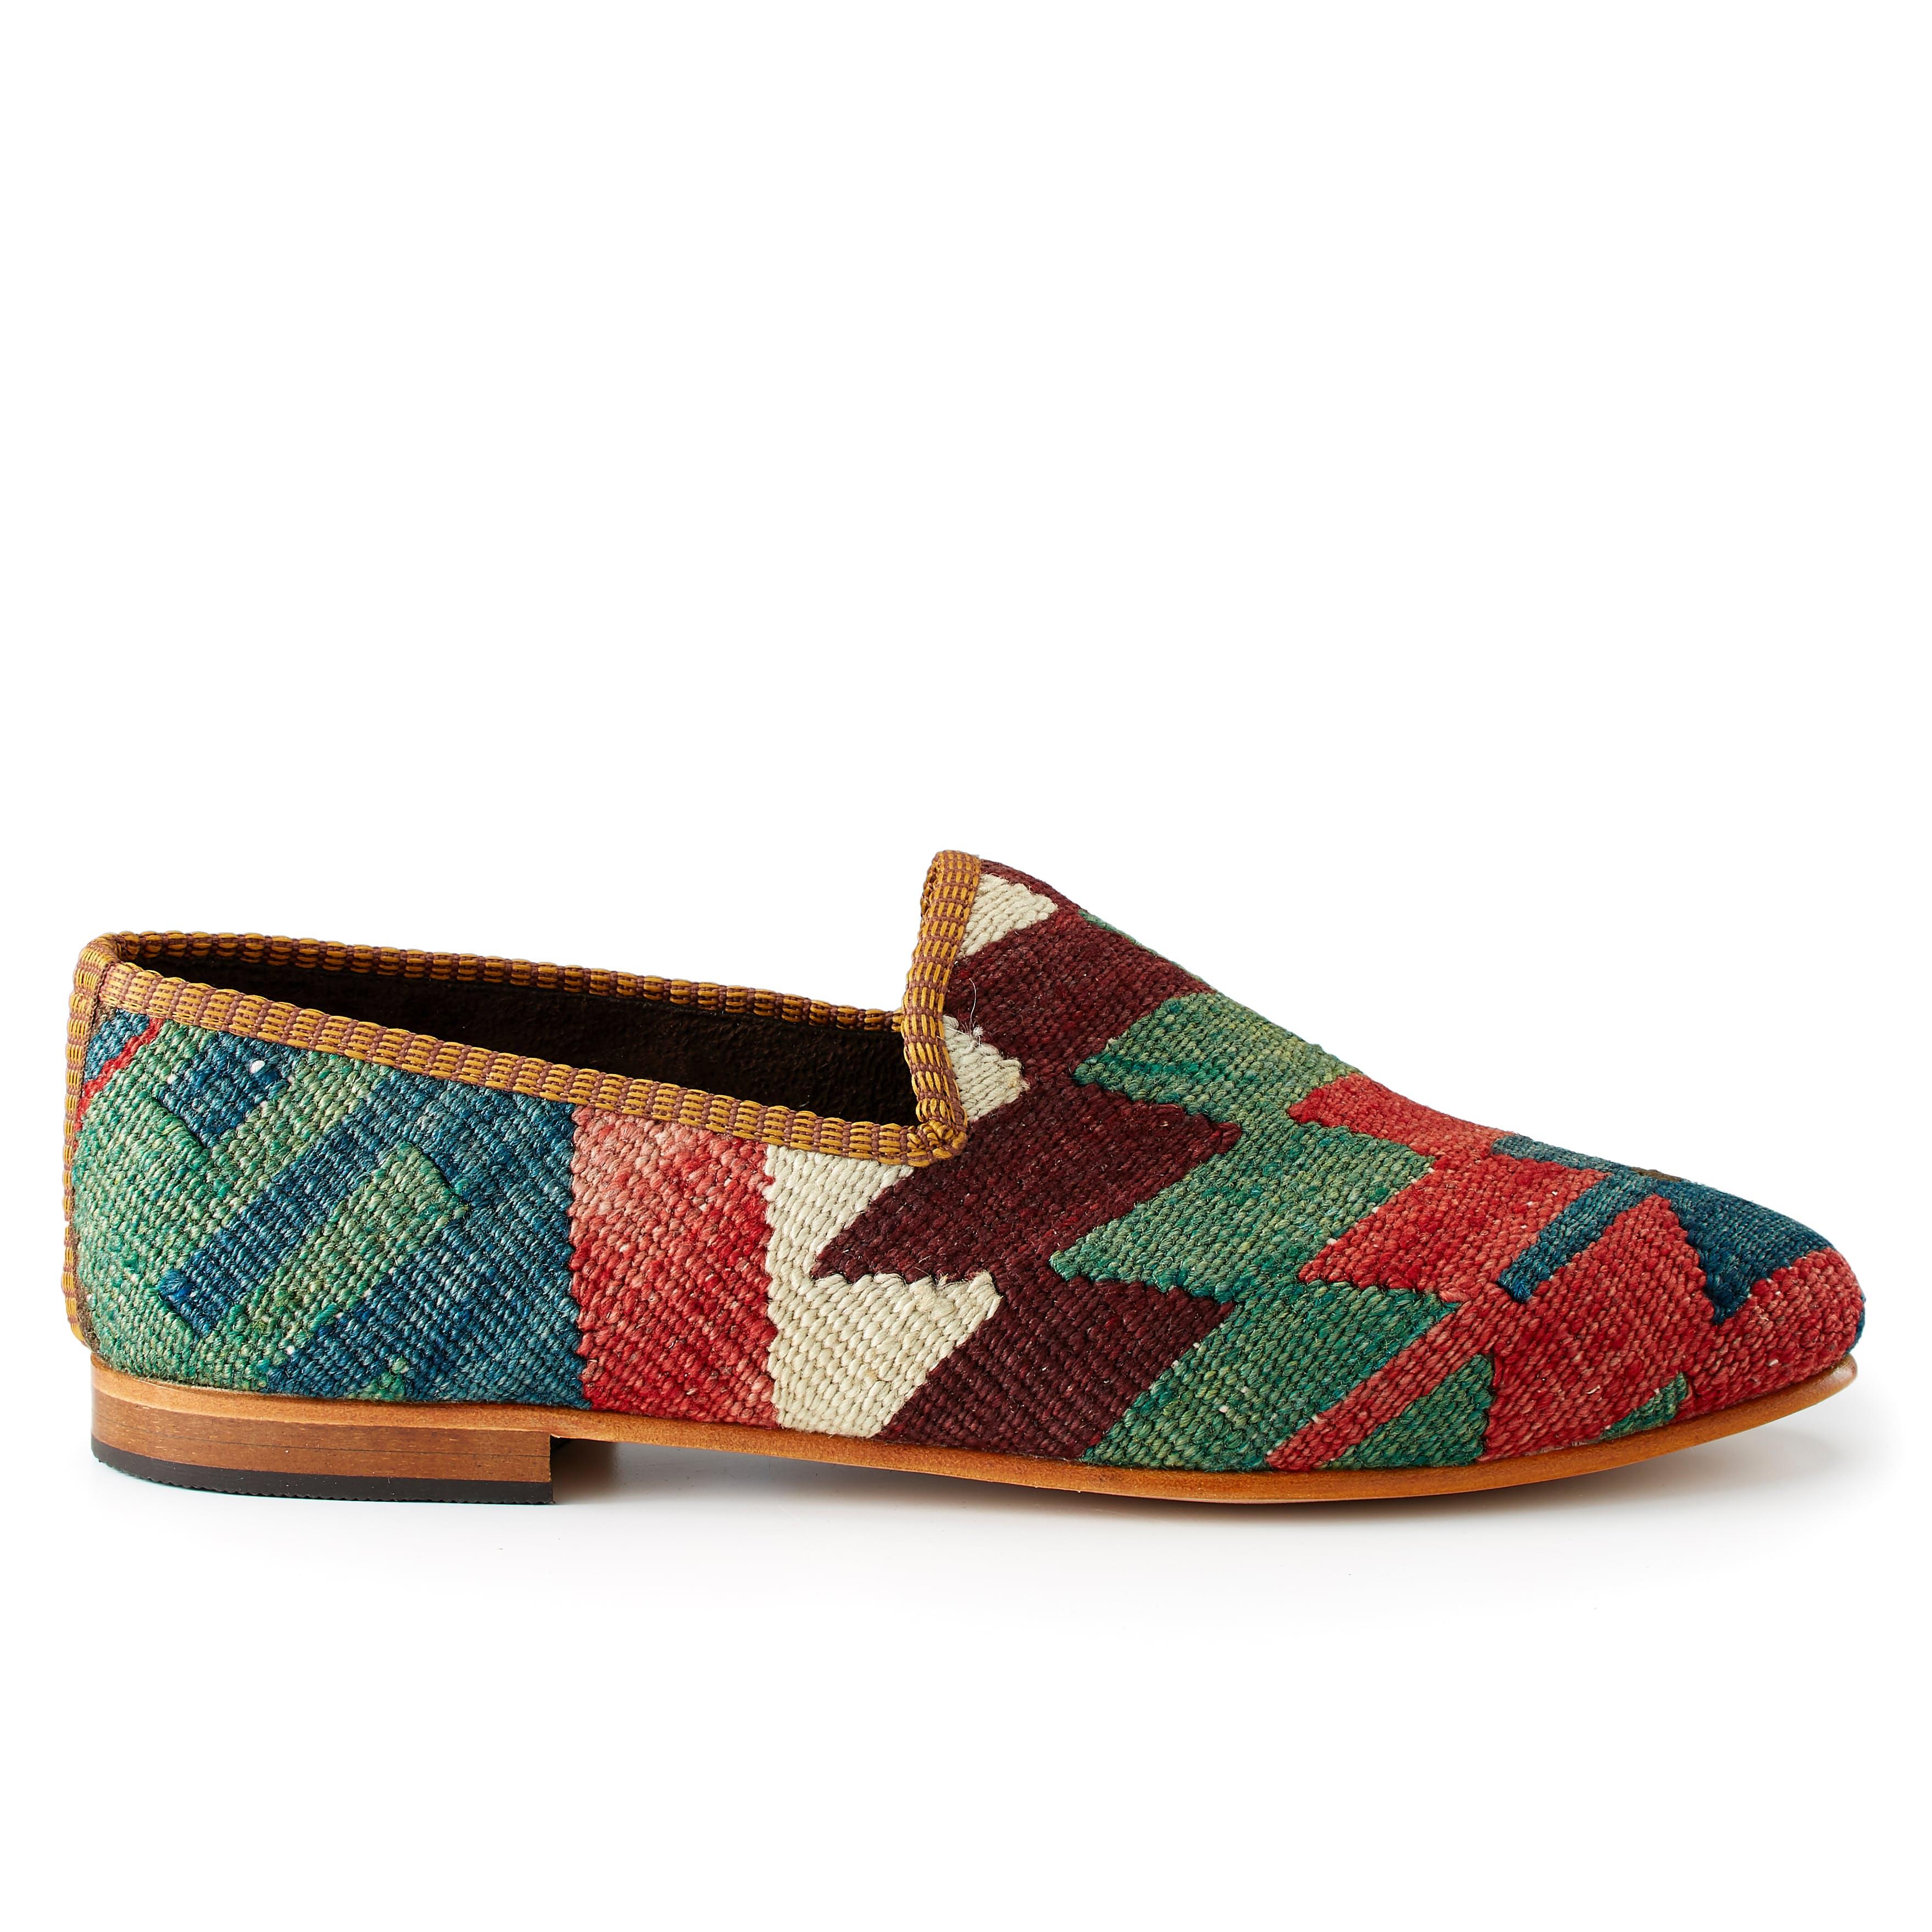 Cm3labqljz artemis design co kilim loafer 0 original.jpg?ixlib=rails 2.1